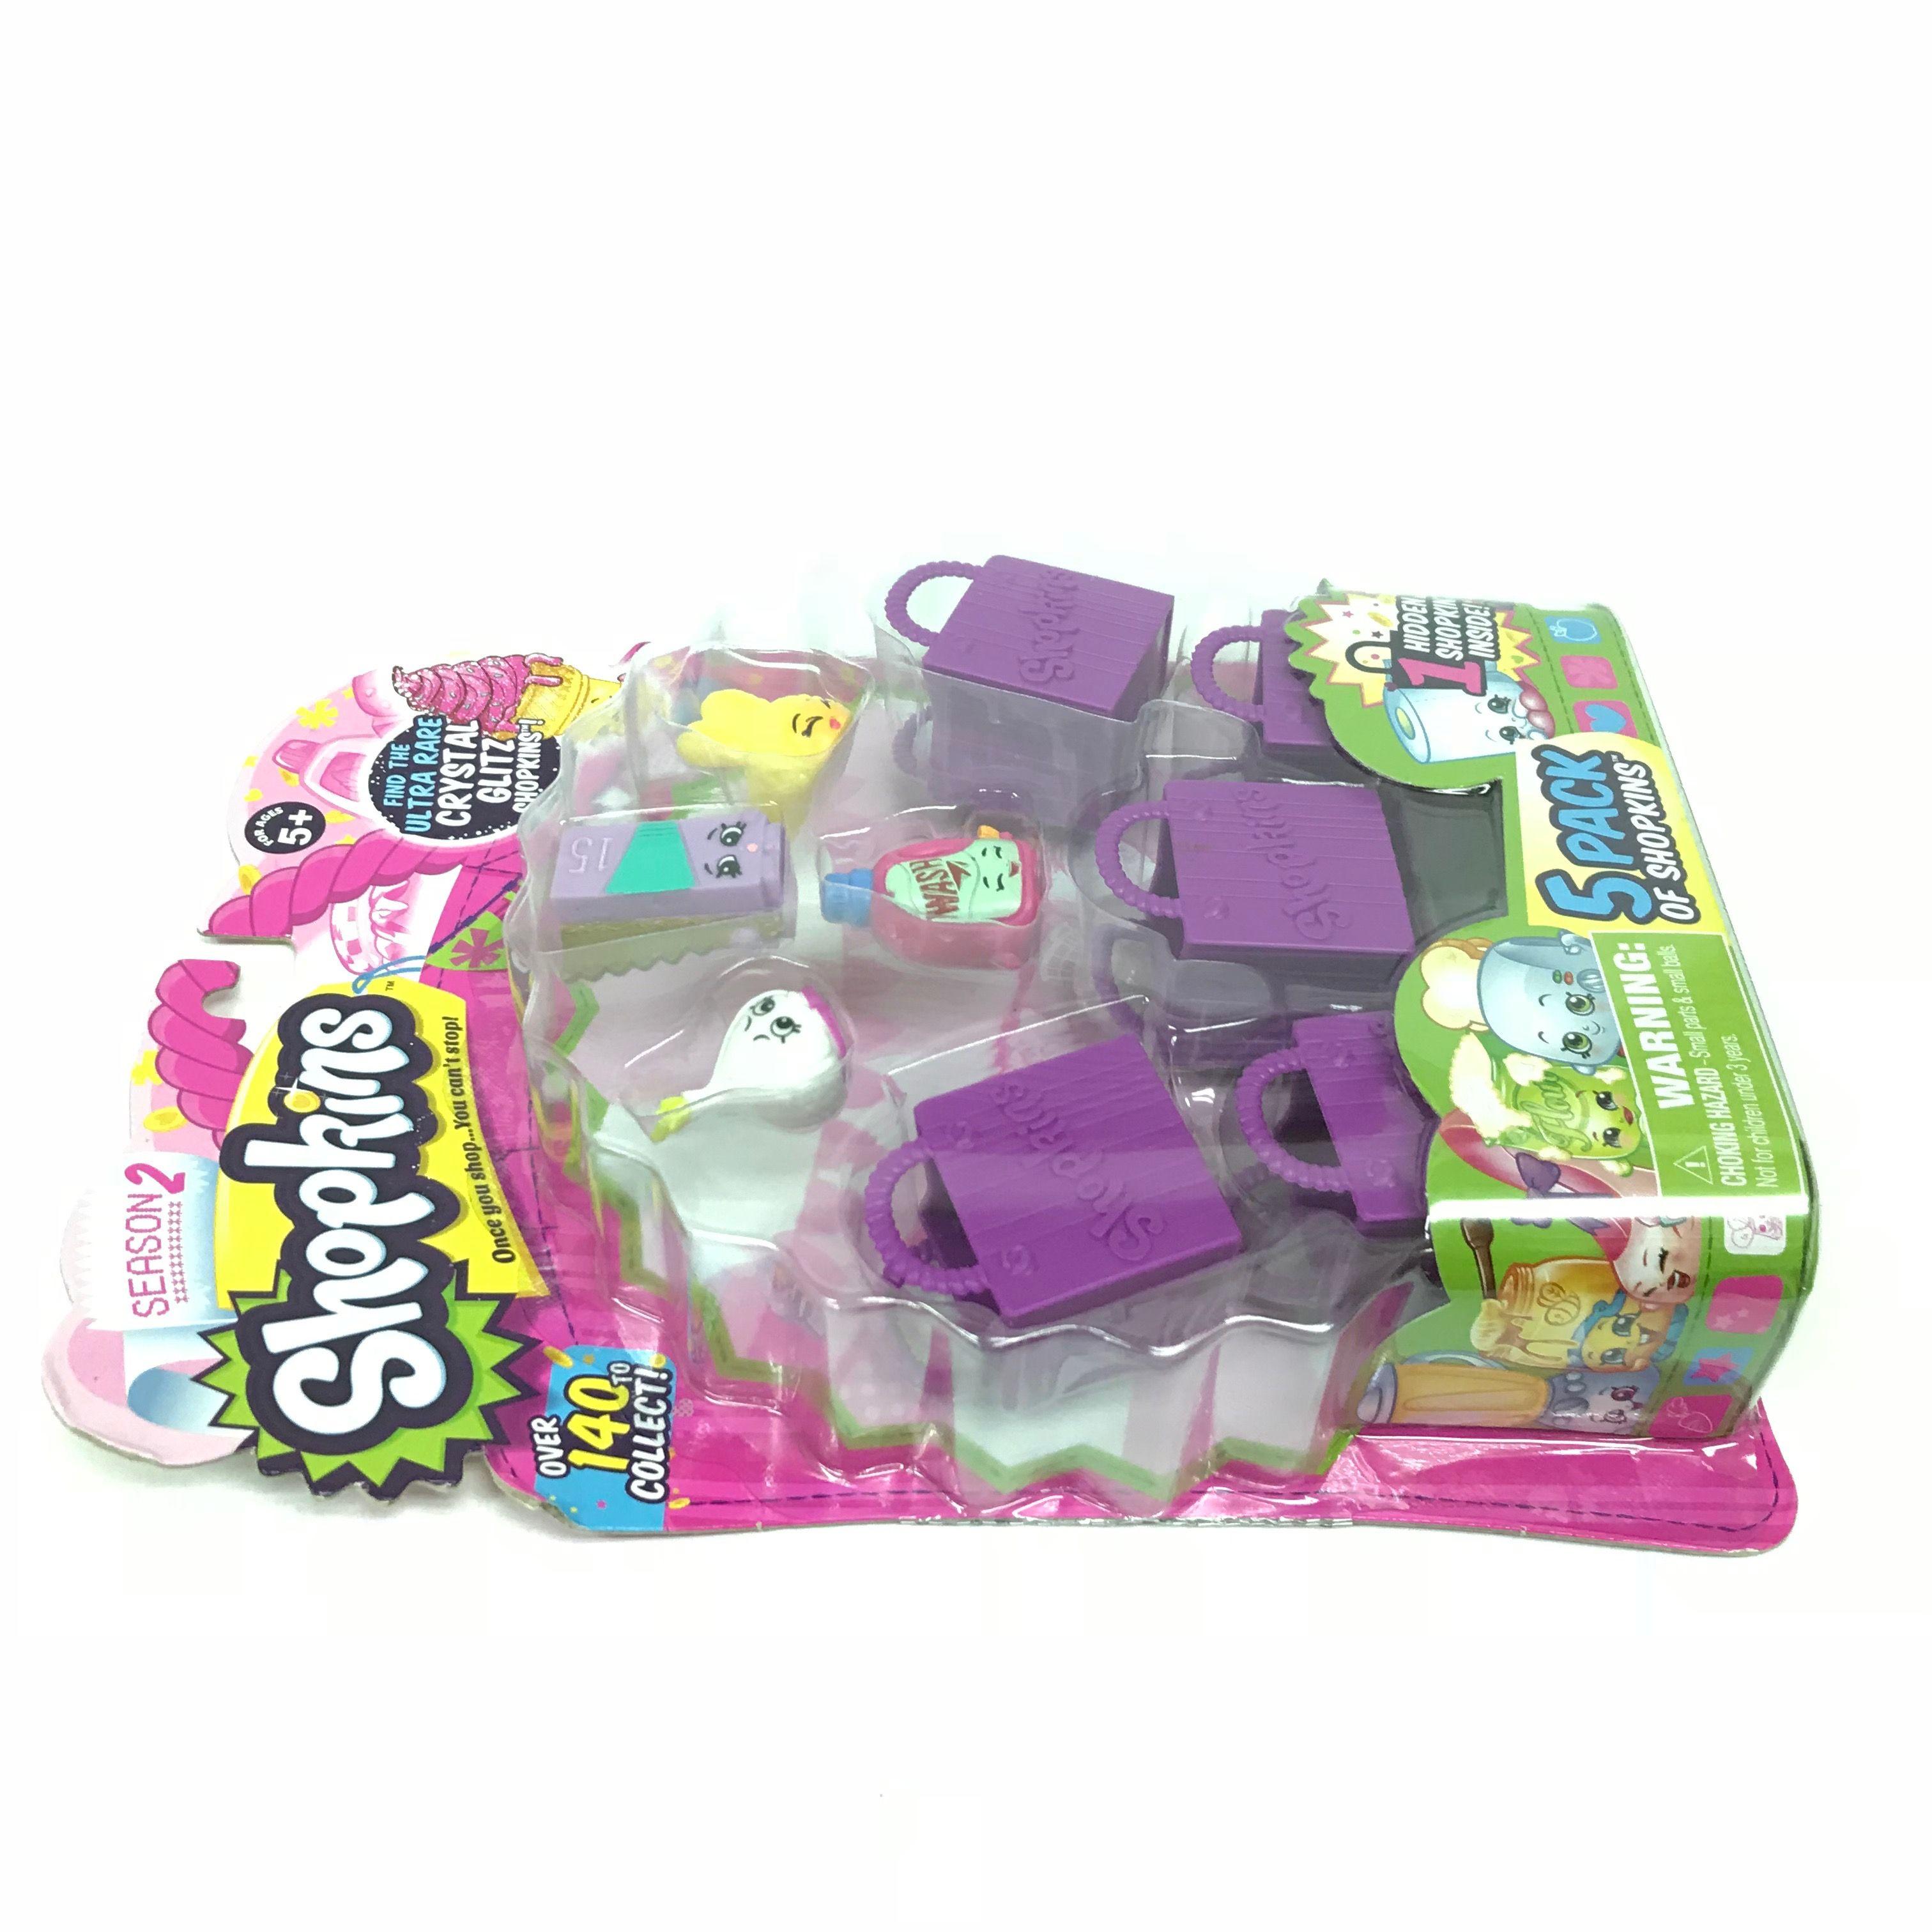 Shopkins-Season-2-Collectibles-Pack-of-5-Bags-Characters-Set thumbnail 14